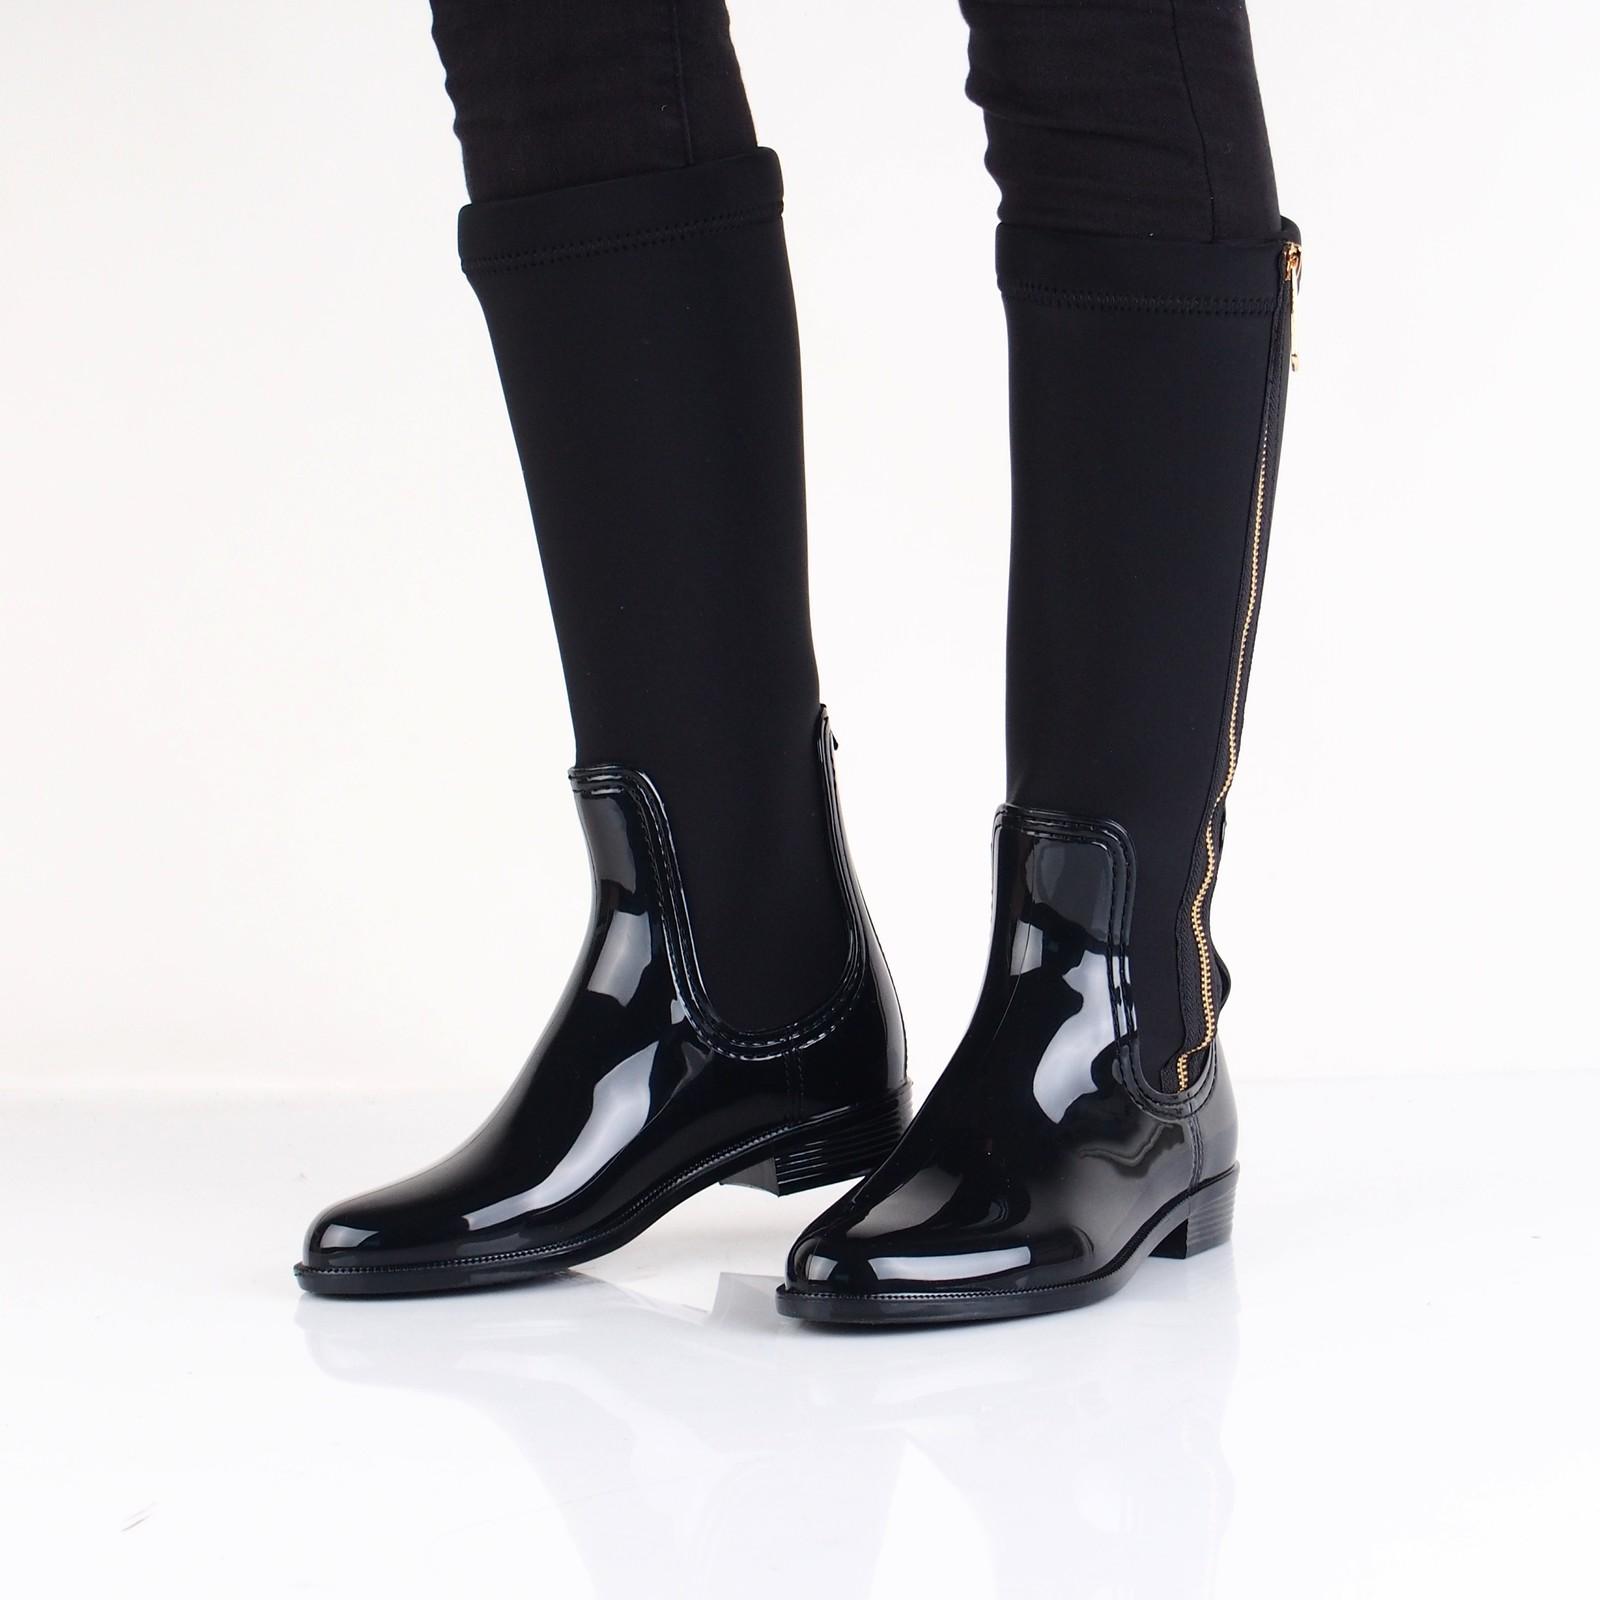 4cab5cb1390b9 Tommy Hilfiger dámske štýlové vysoké čižmy - čierne | FW0FW03564990 ...